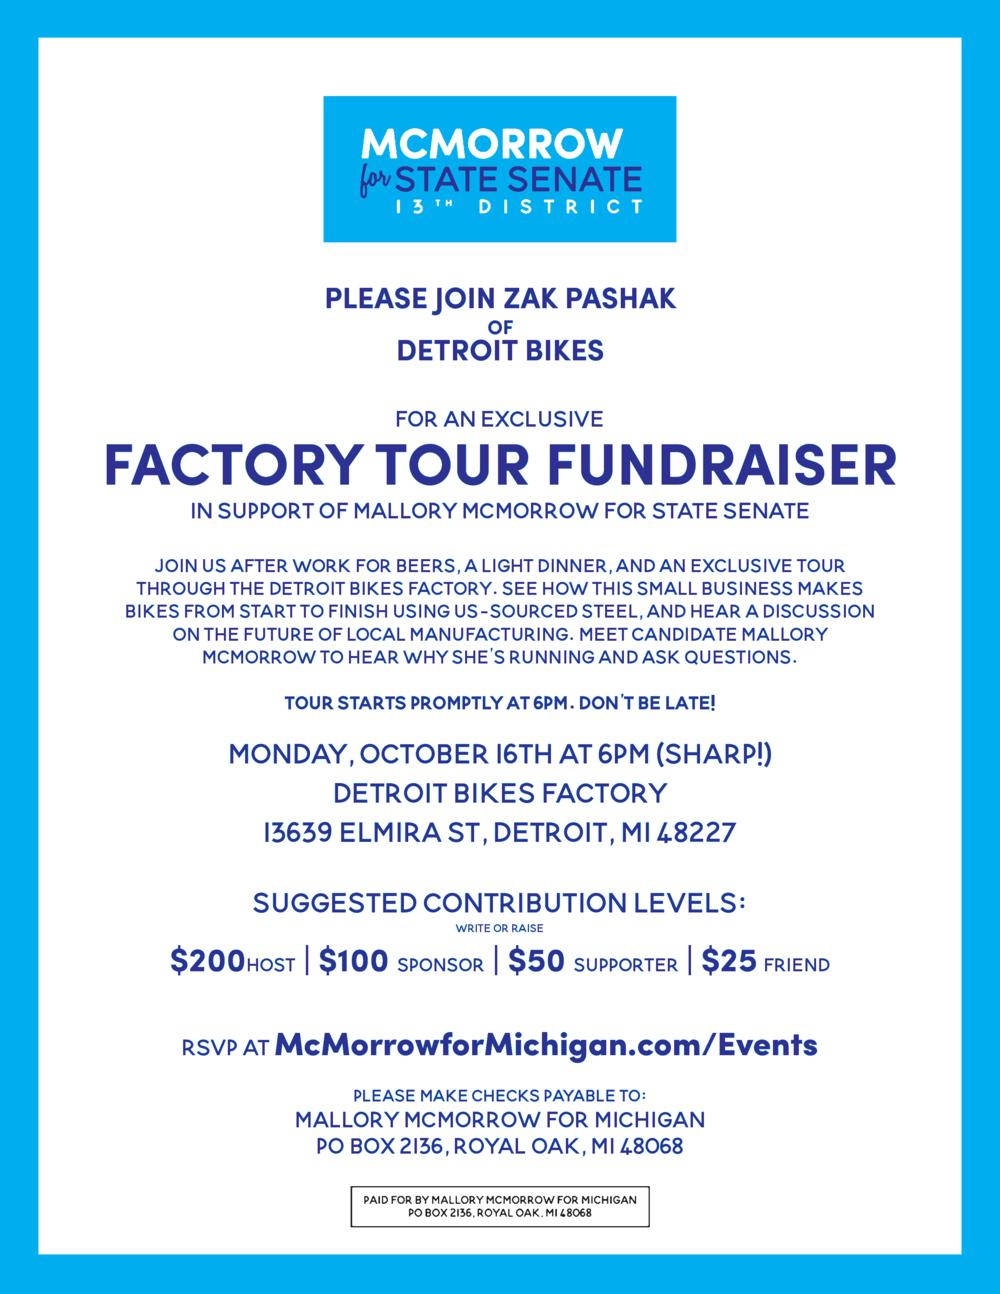 detroitbikes_fundraiser_invite.png